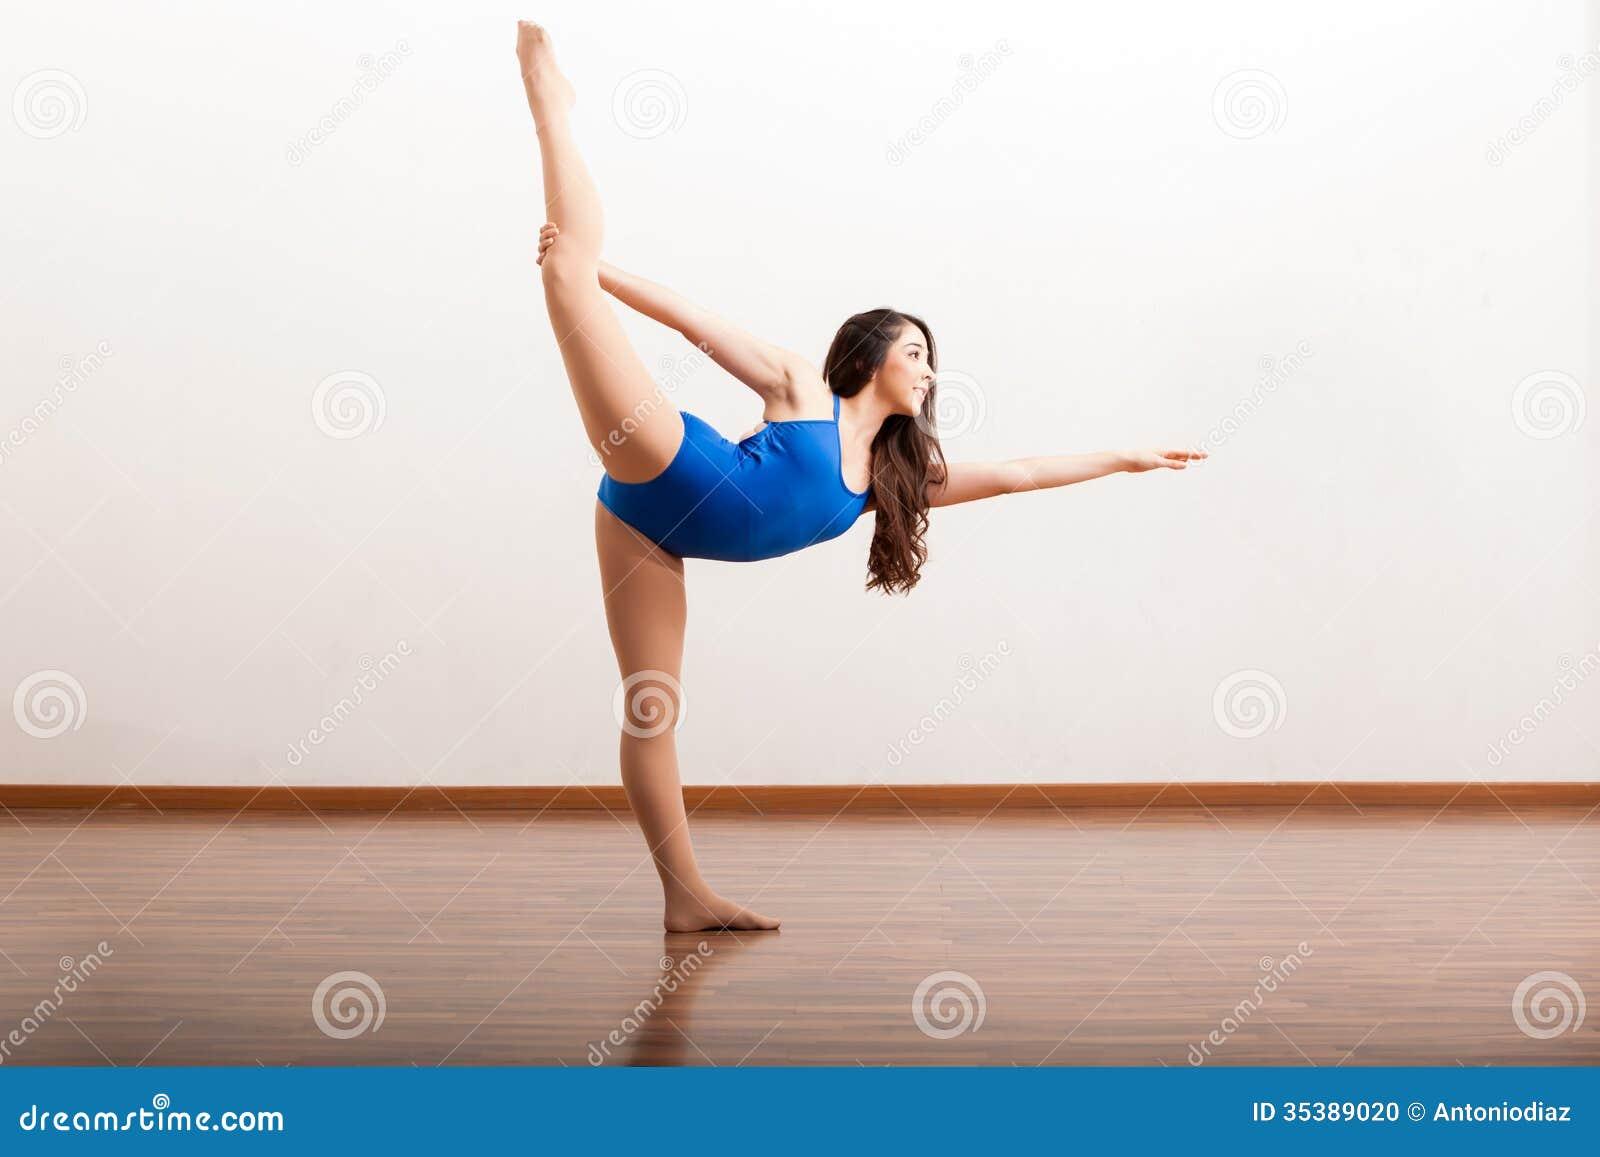 Damn amateur ballet dancer practicing fucking love